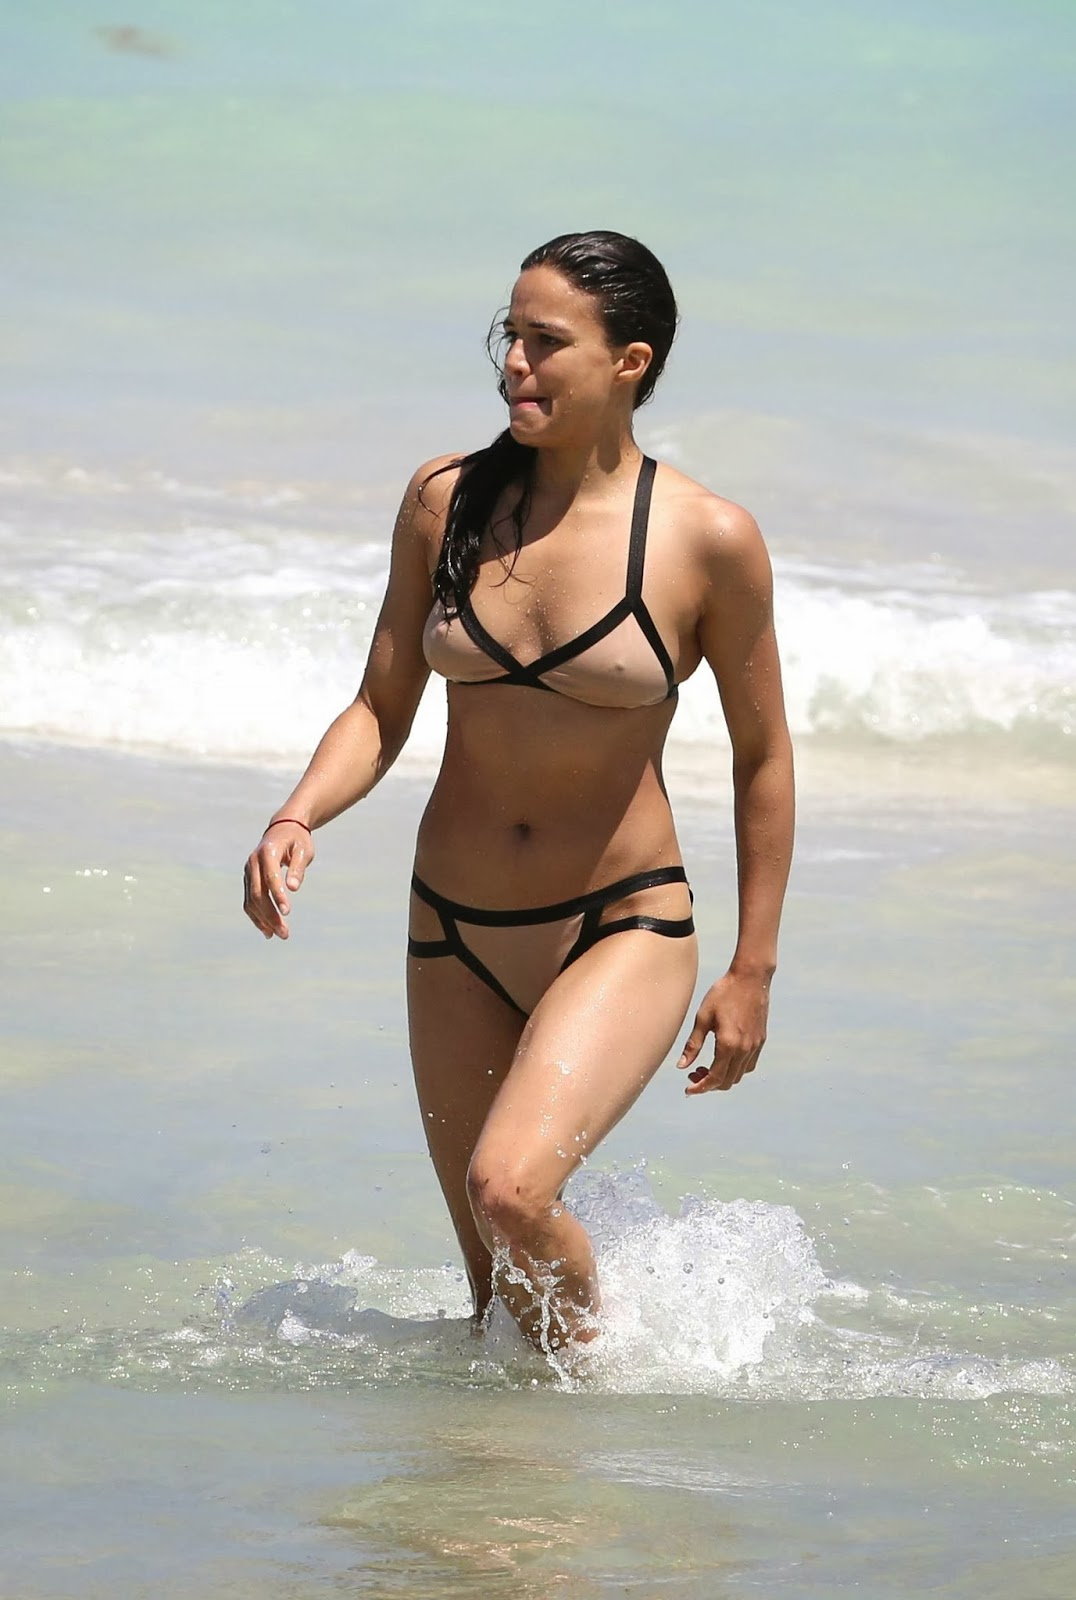 Michelle Rodriguez Bikini Bodies Pic 29 of 35